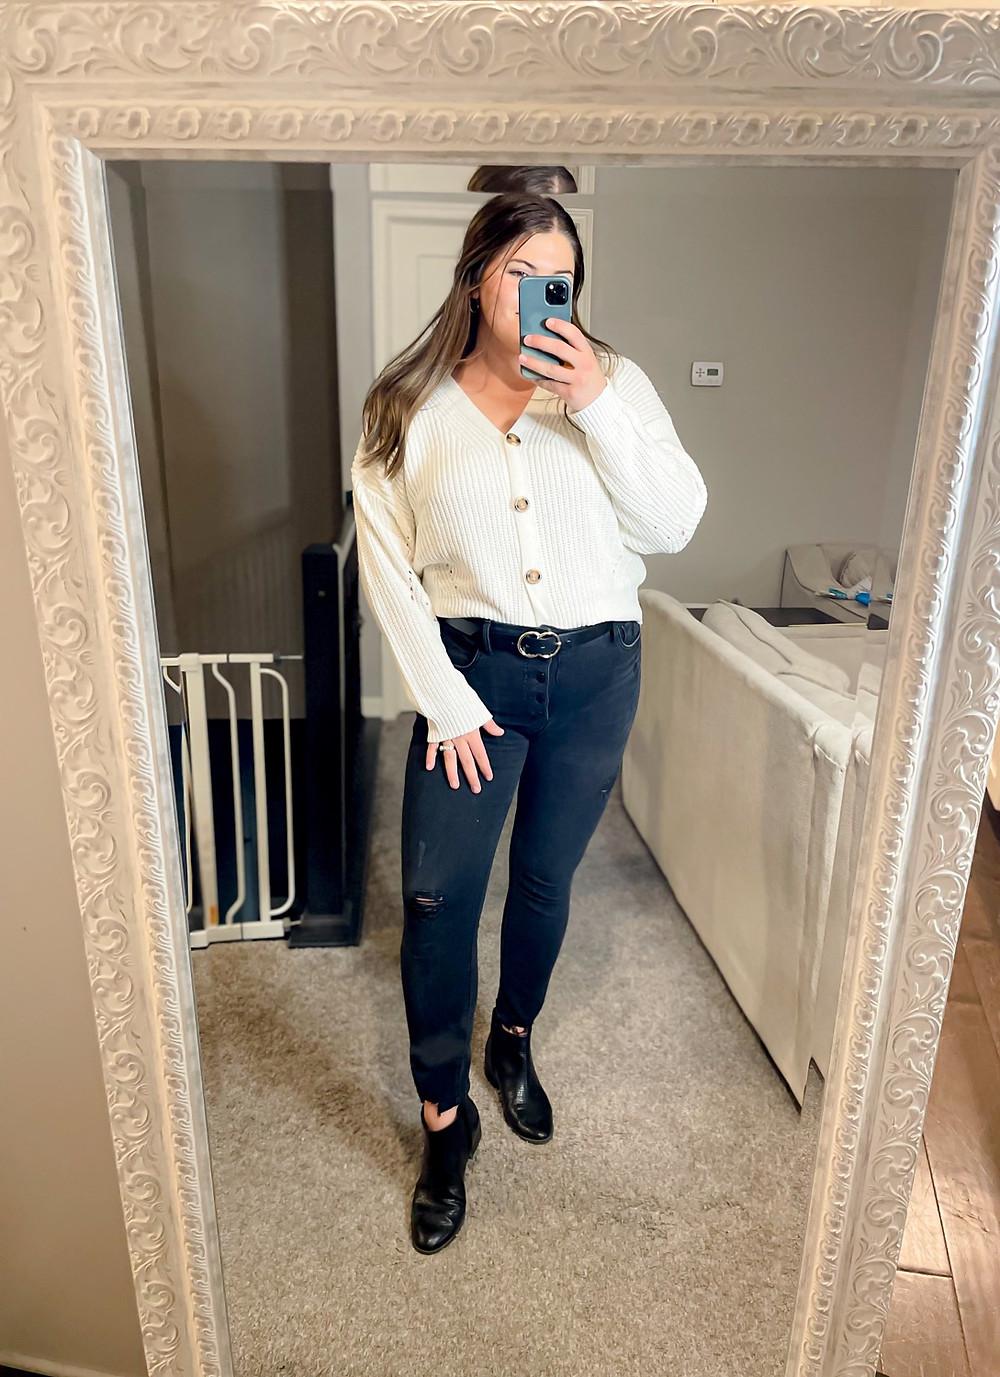 Black Highwaisted  jeans a boyfriend cardigan